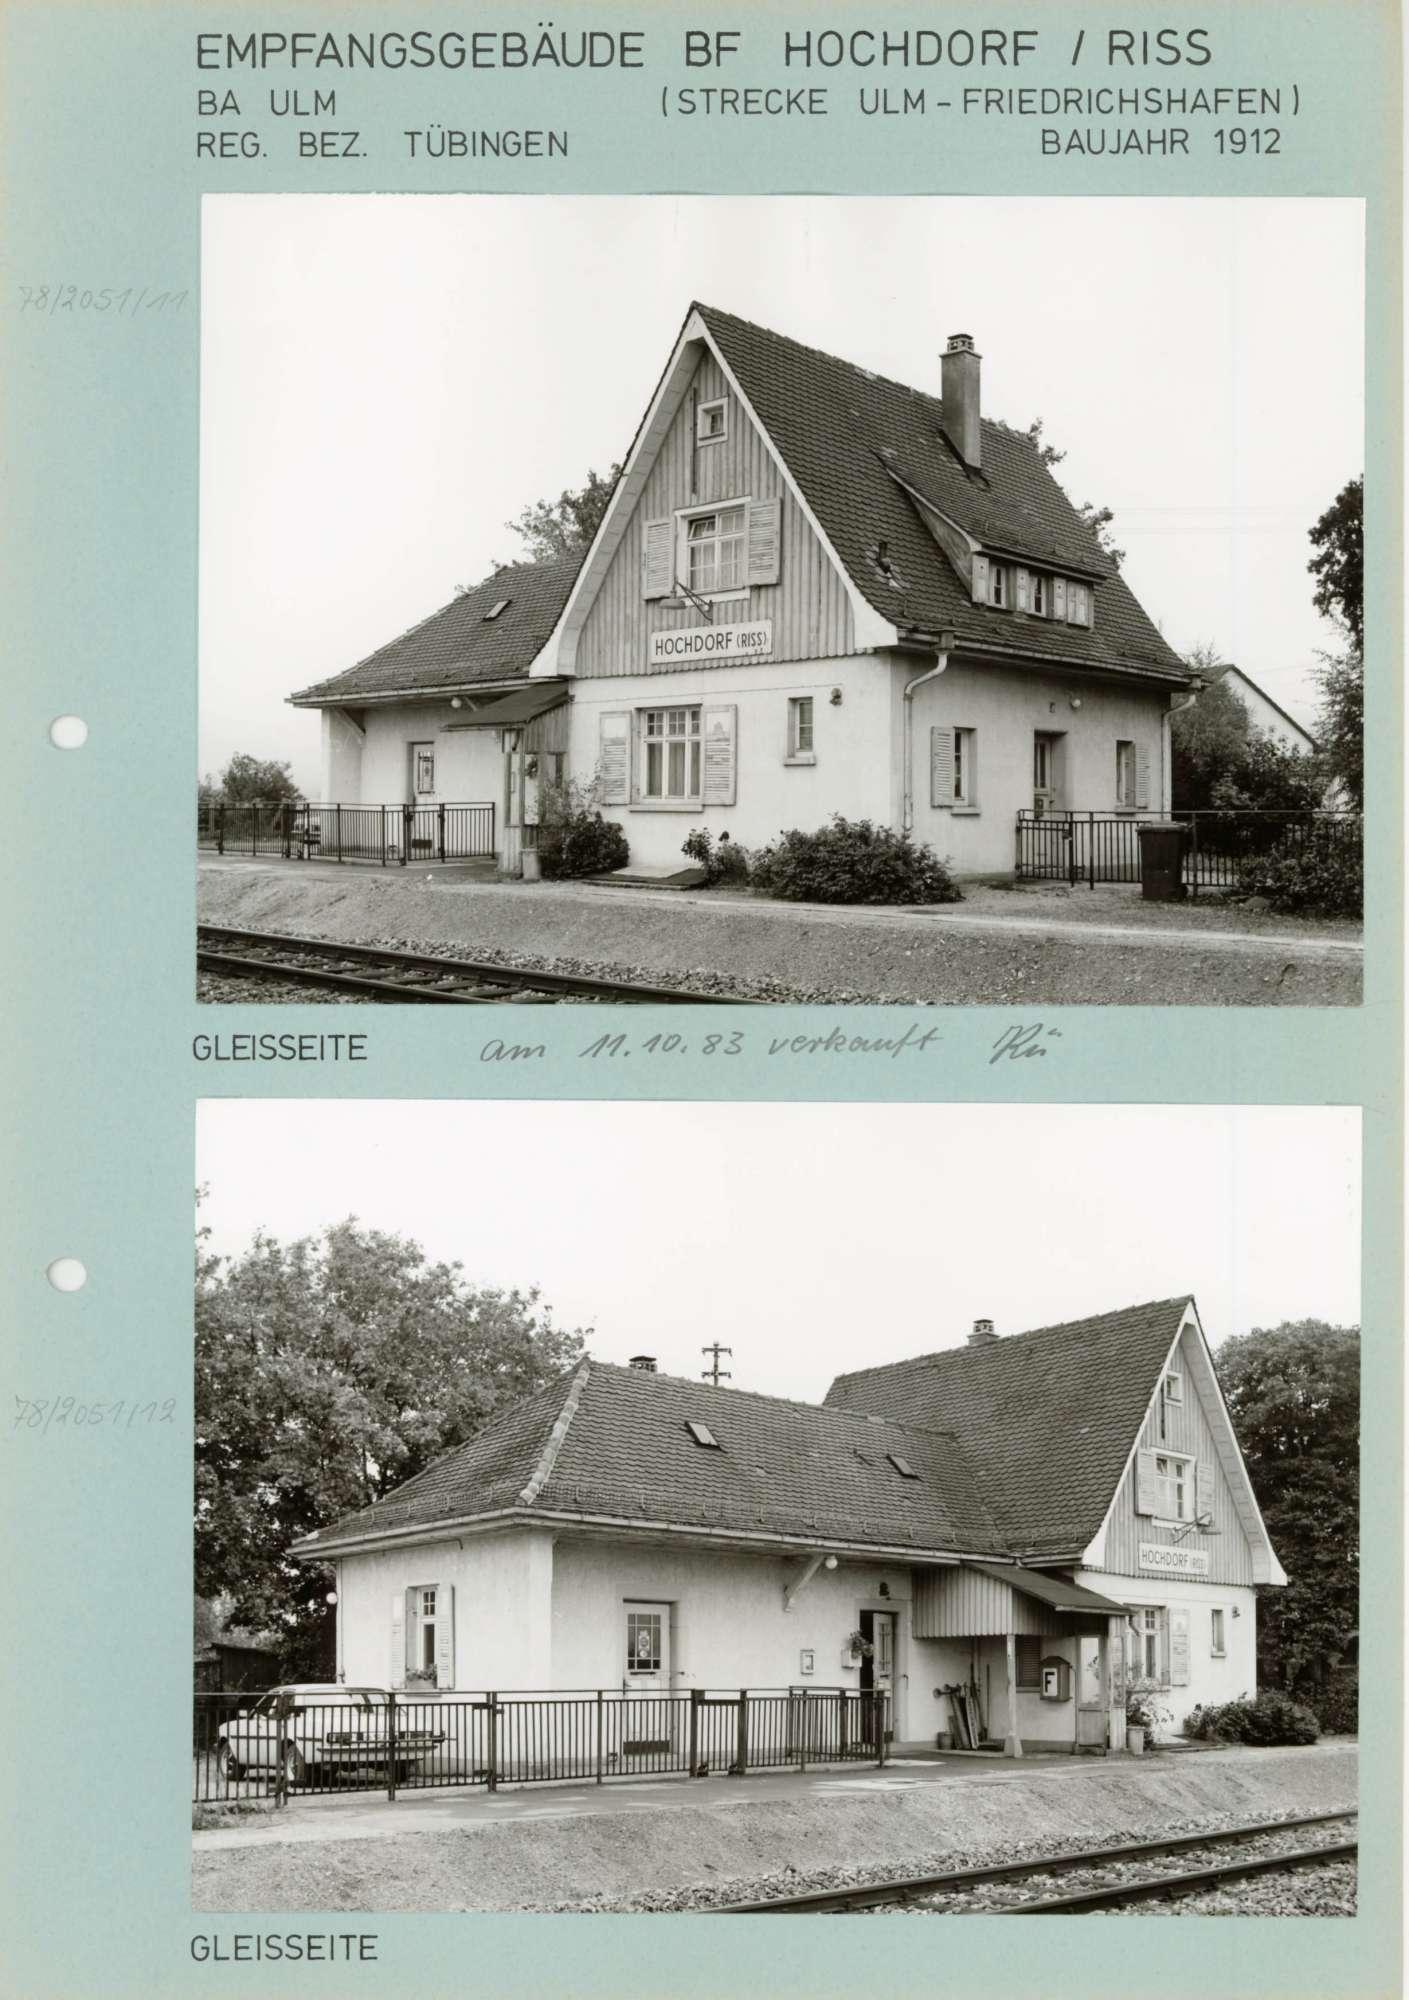 Hochdorf (Riß): 8 Fotos, Bild 1